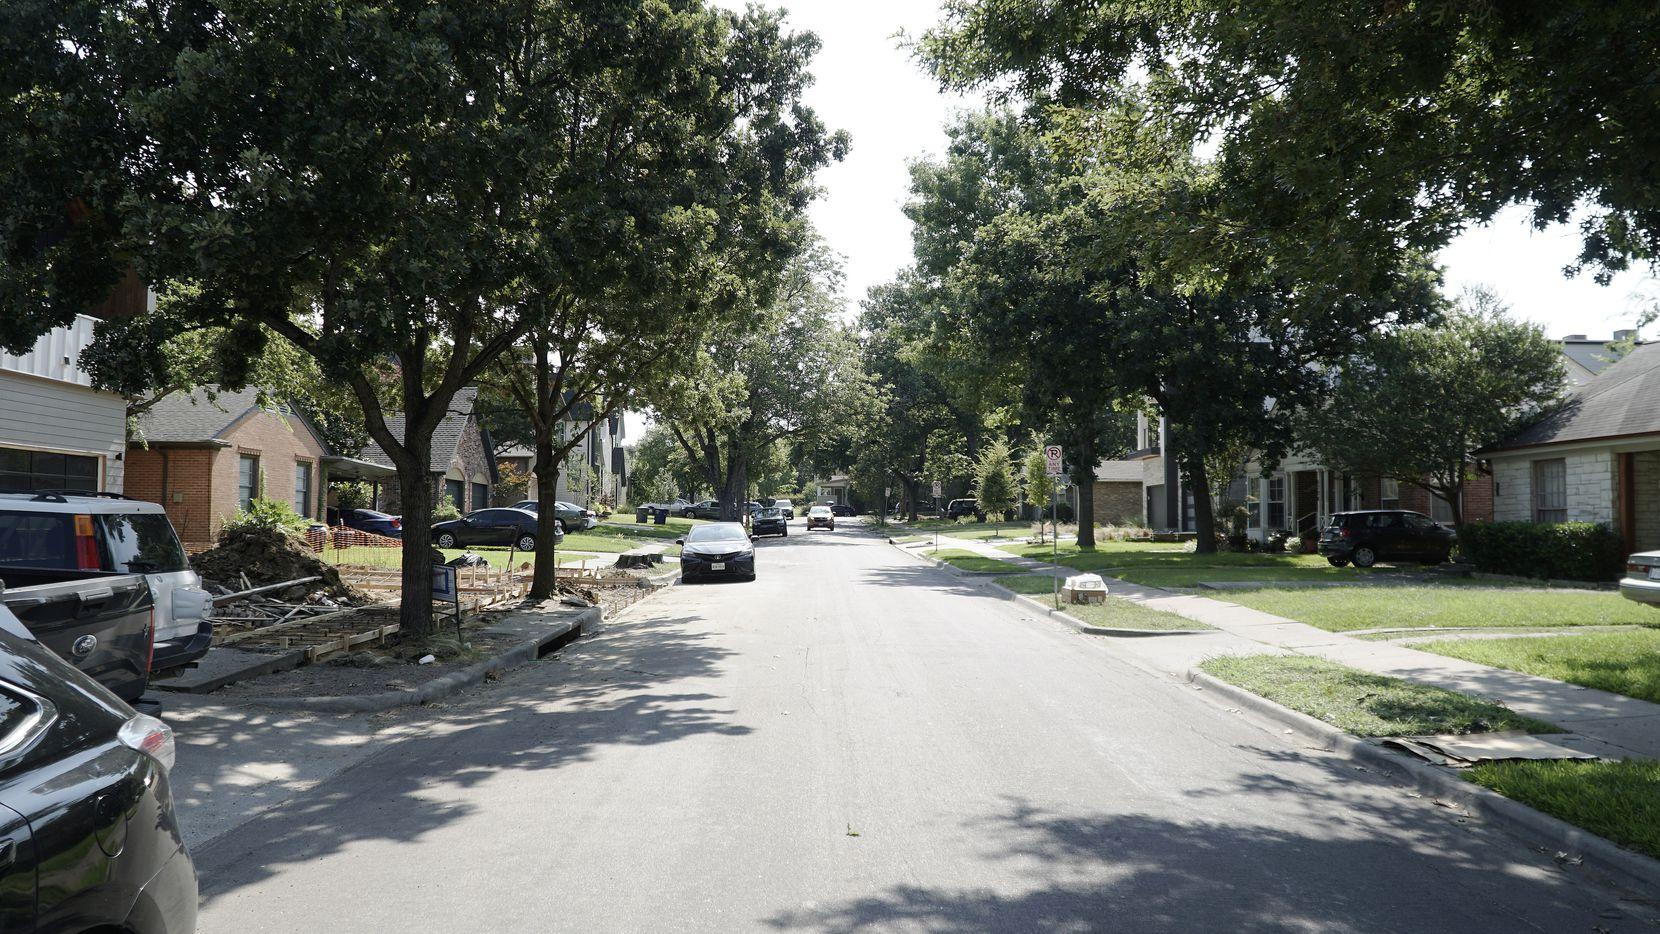 Scenes from Lower Greenville Avenue in Dallas on Saturday, July 31, 2021.